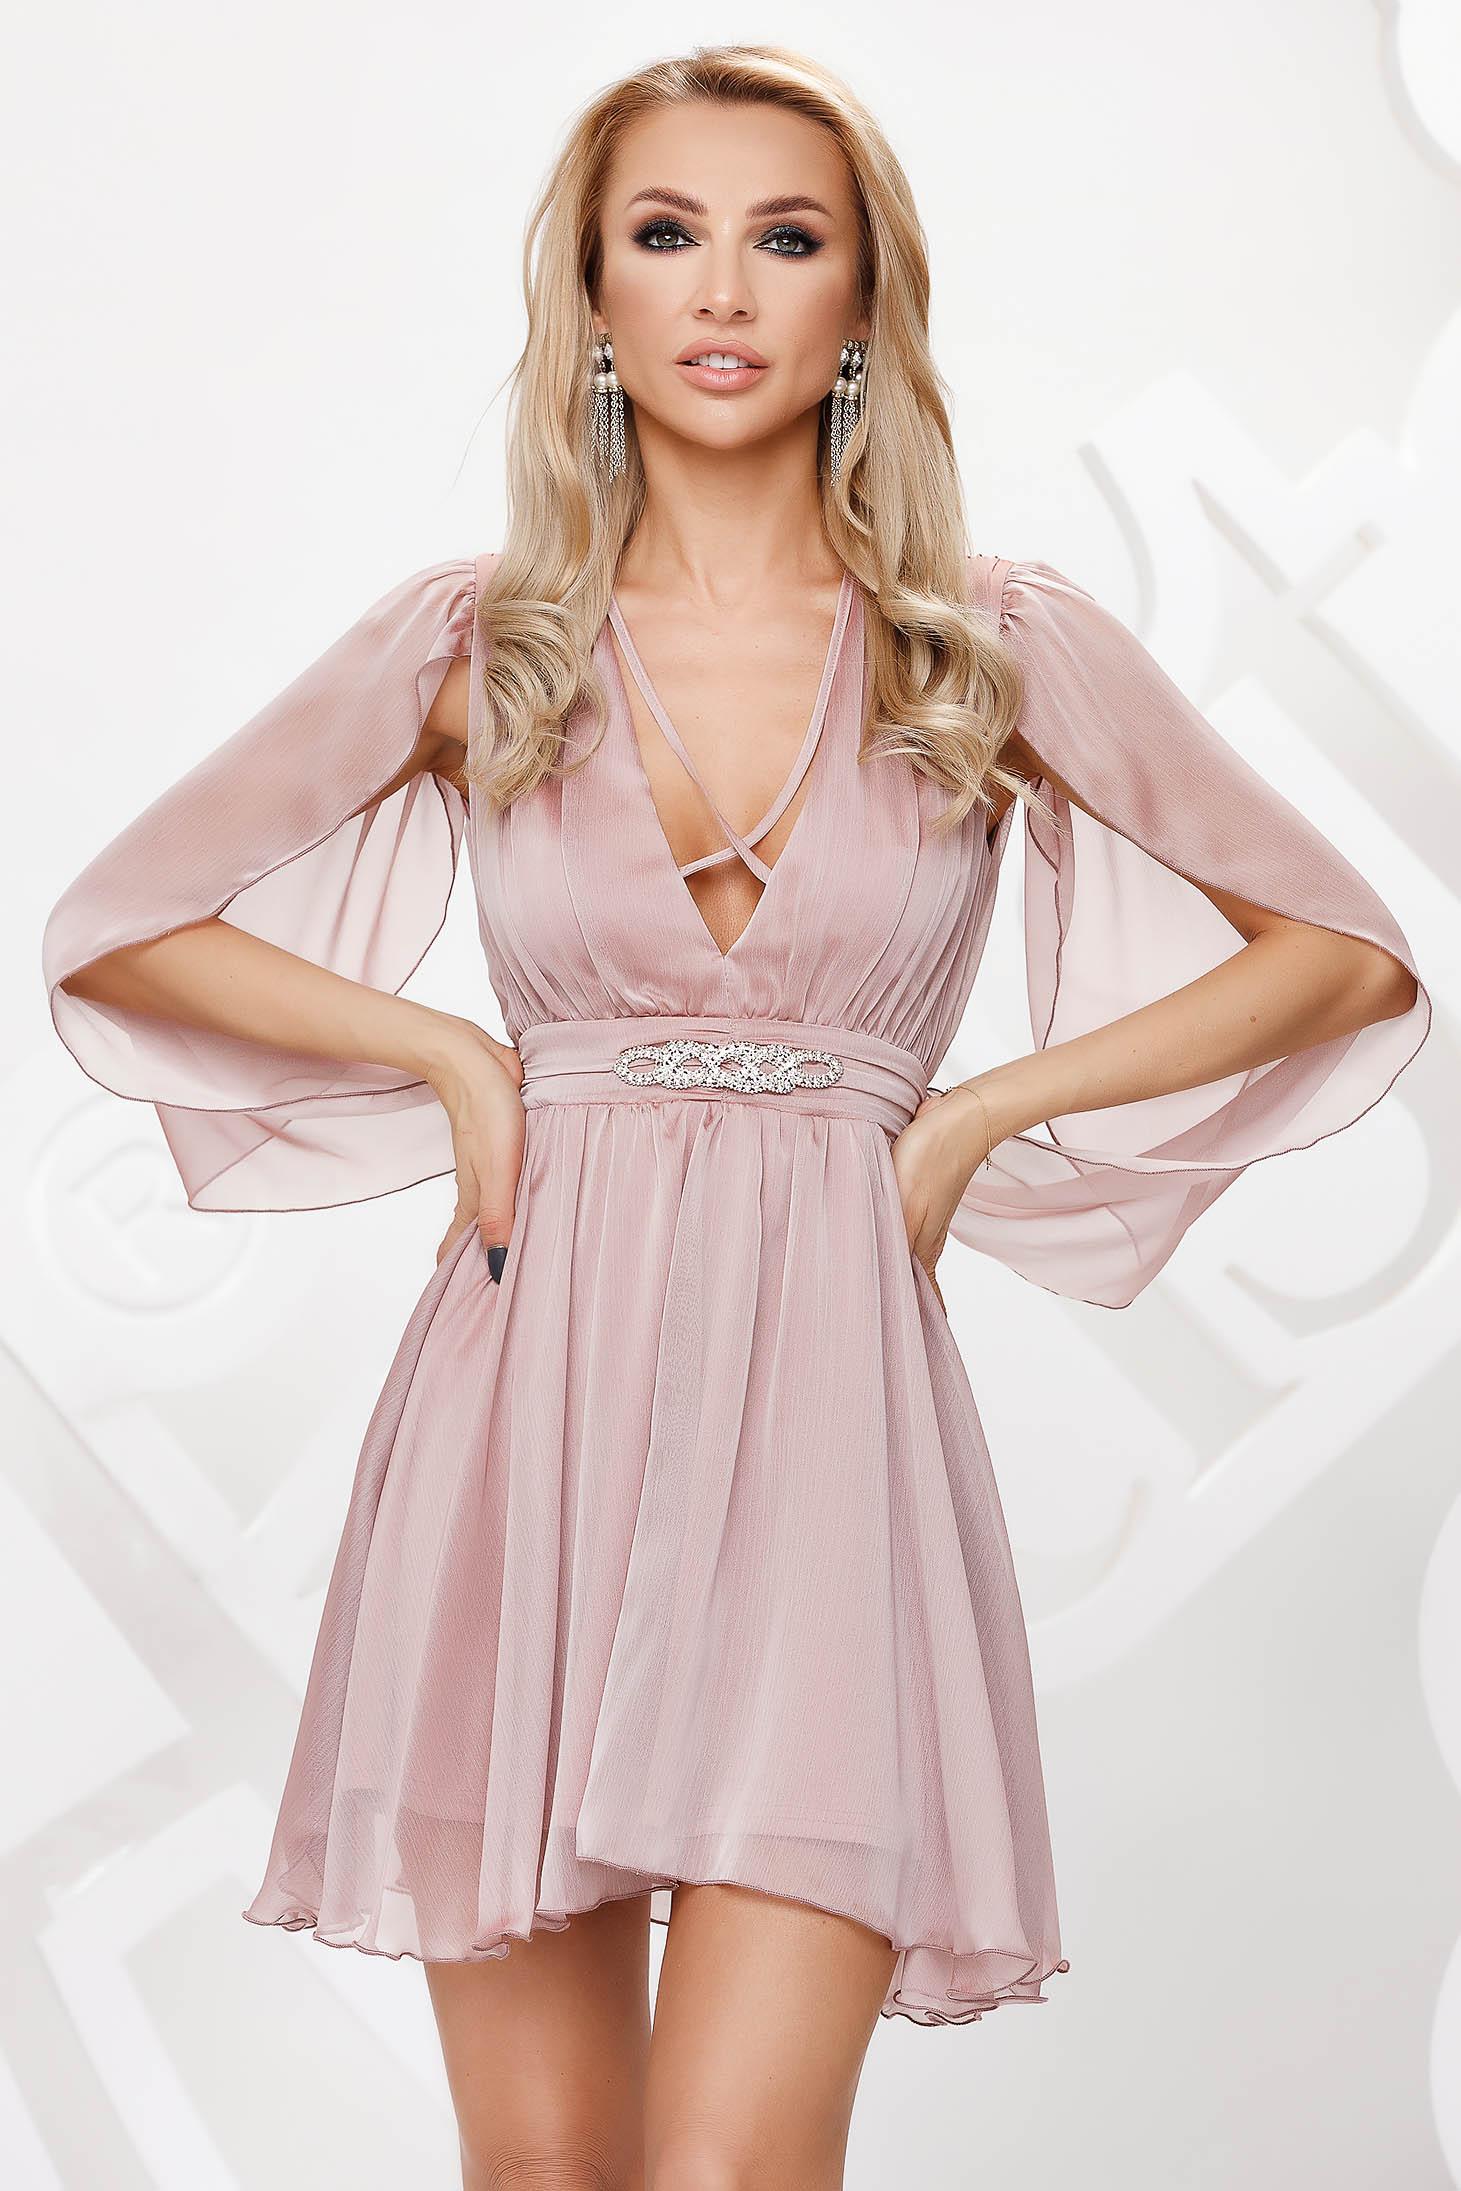 Rochie Artista roz prafuit din voal de ocazie in clos din material vaporos si transparent accesorizata cu pietre stras